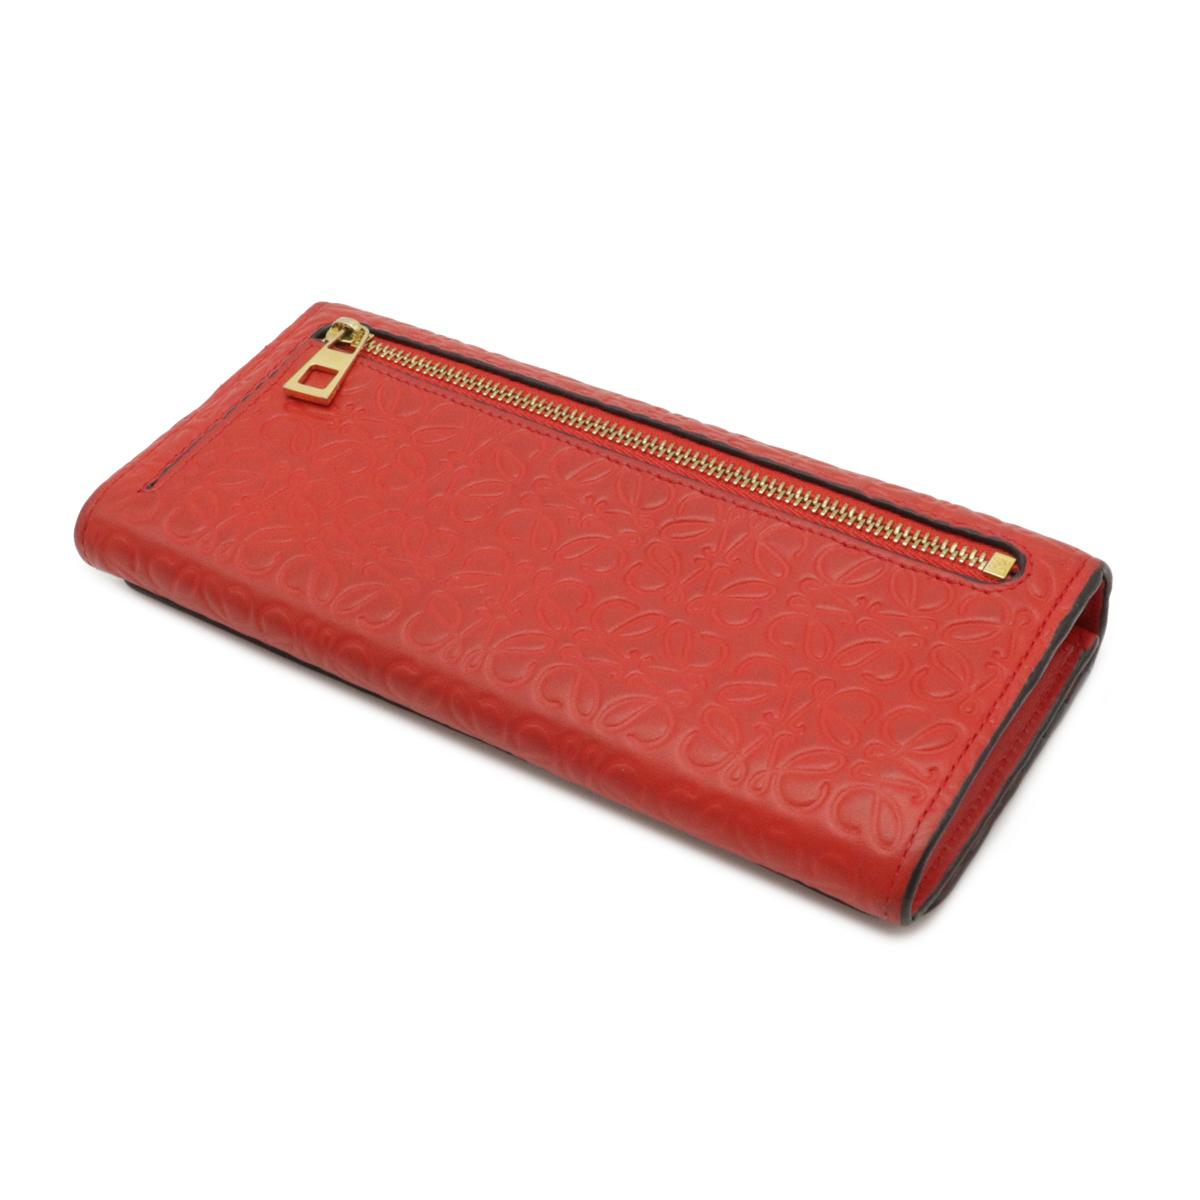 LOEWE Anagram Repeat Zippy Wallet Round Fastener Purse Embossed Leather Red